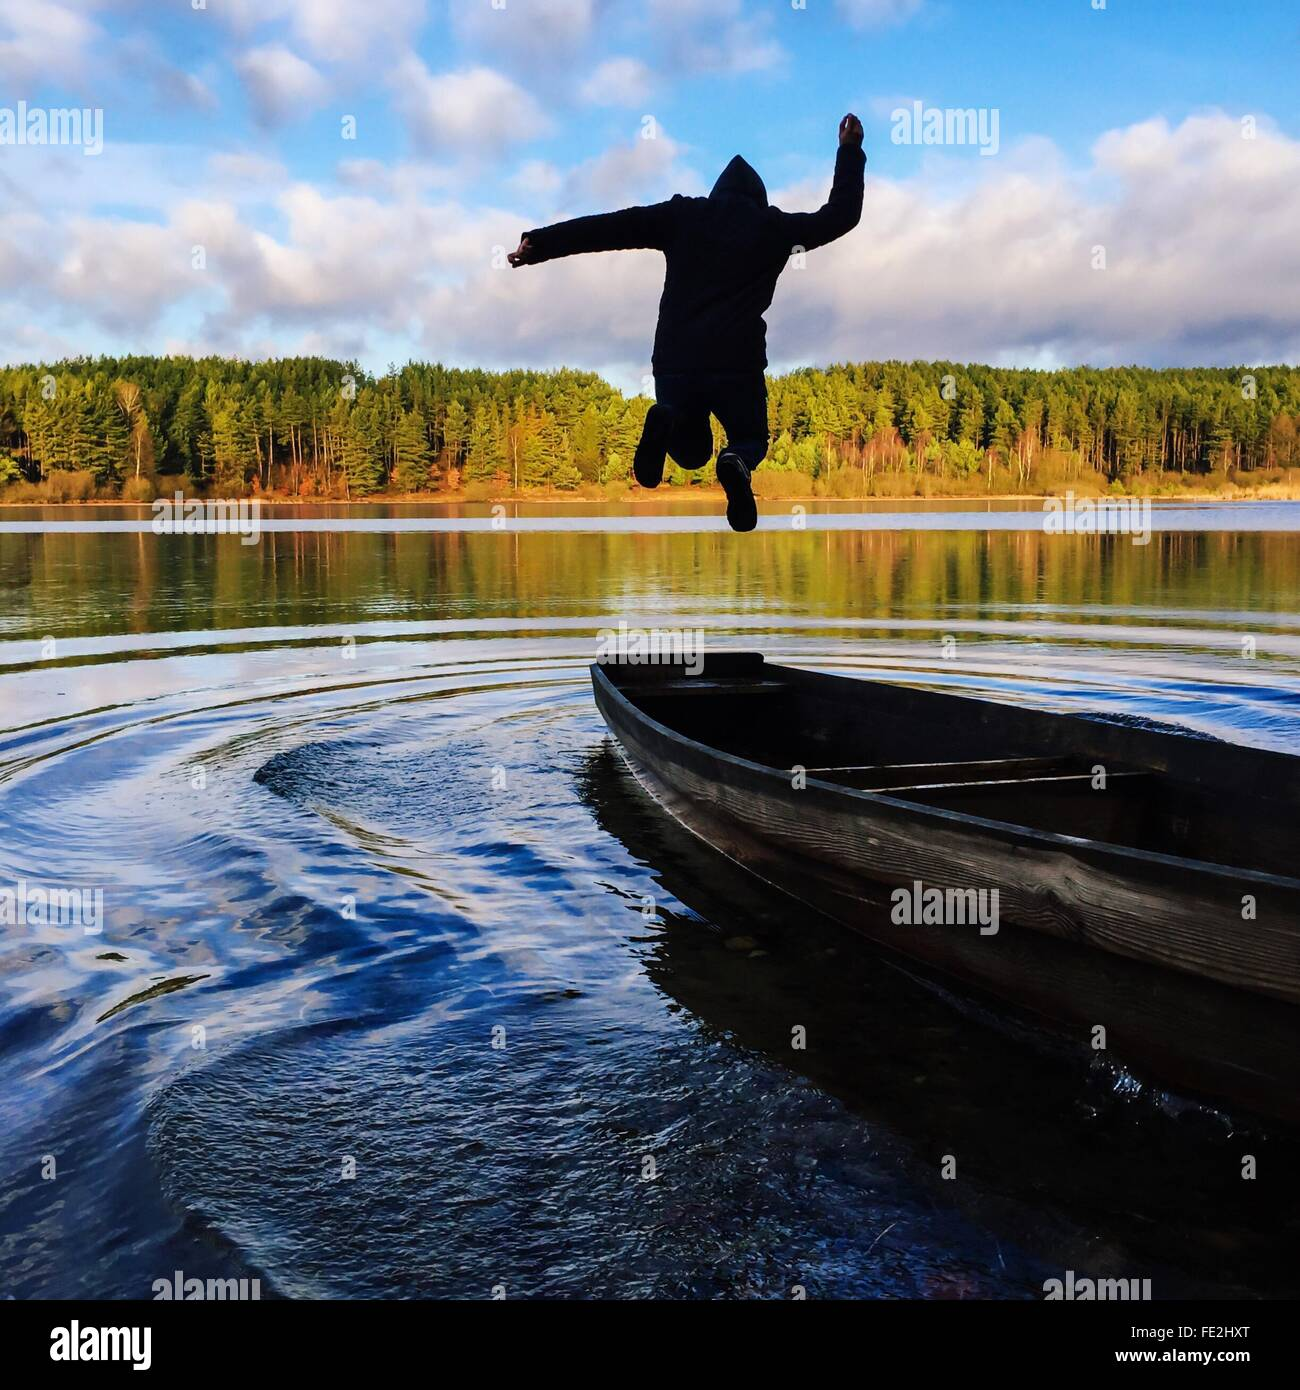 Man Jumping Into Boat - Stock Image